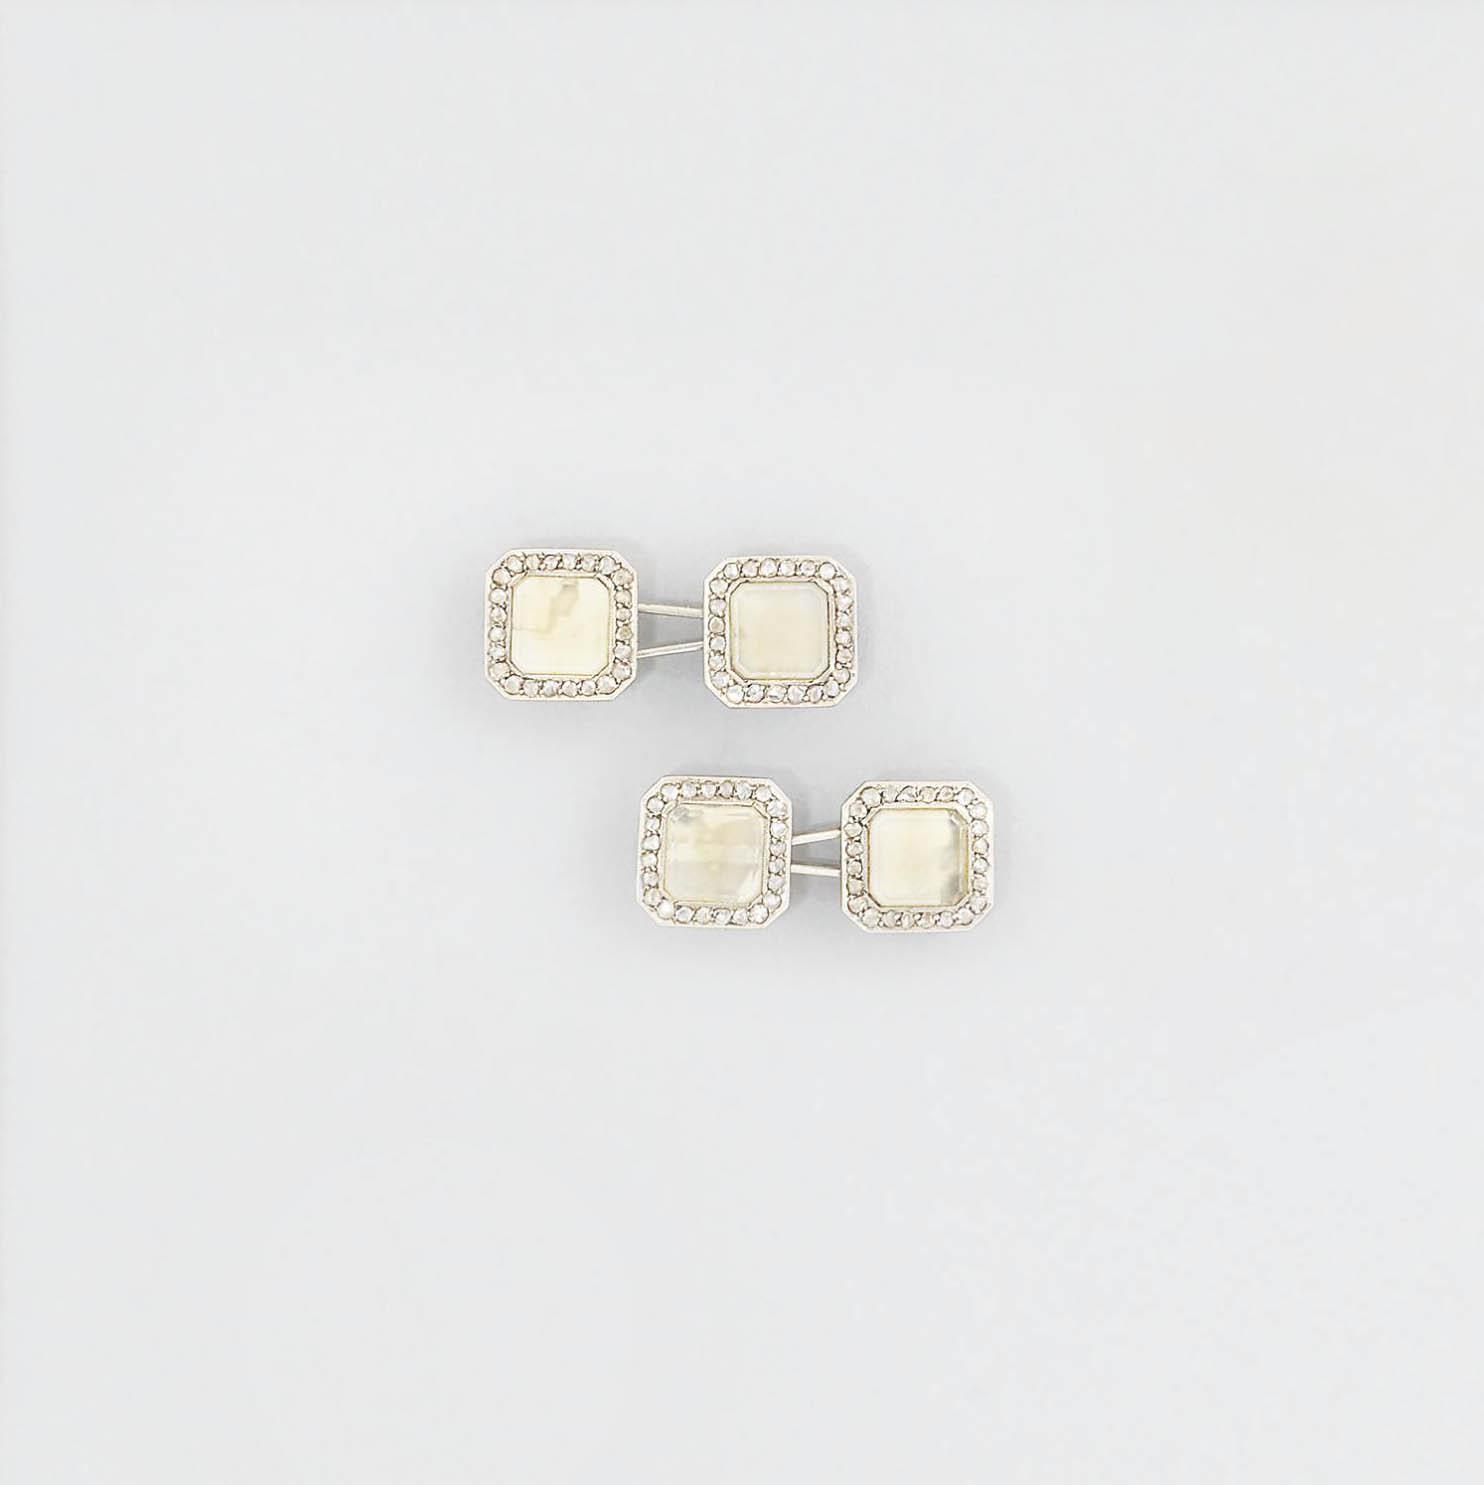 A pair of Art Deco diamond-set